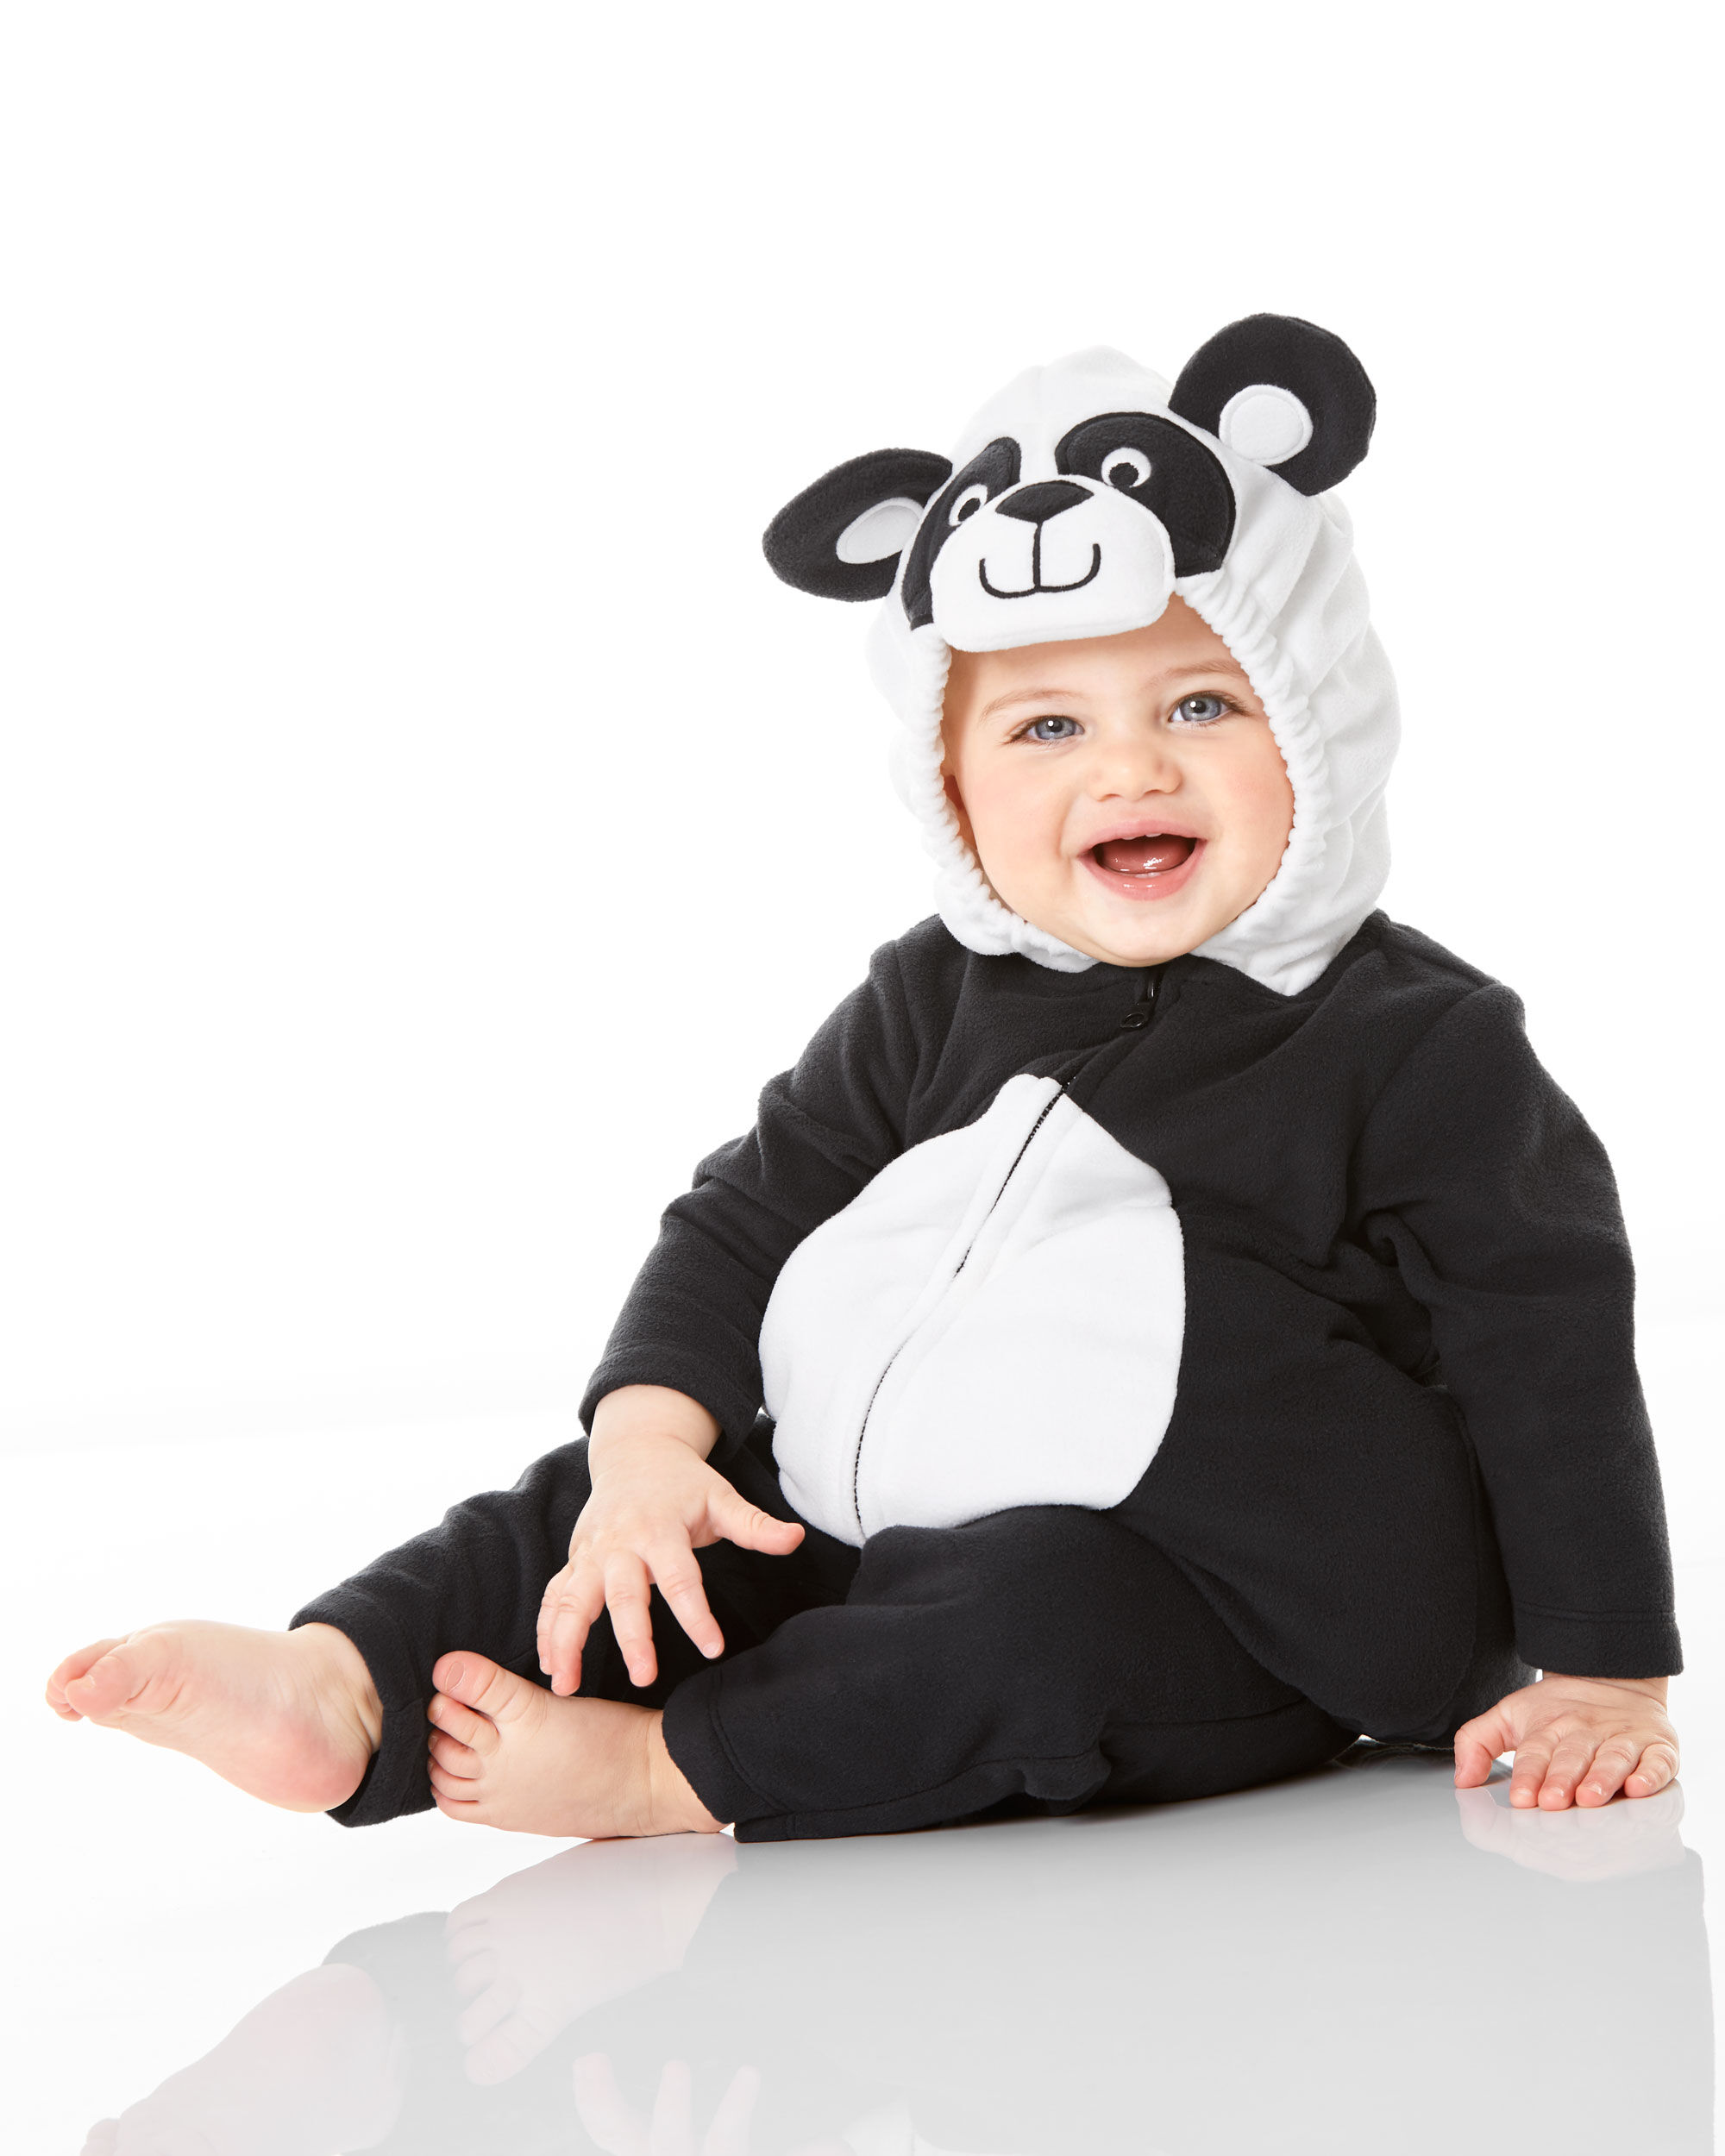 CARTER/'S Baby Dalmatian Dog Halloween Costume 3-6 months NEW